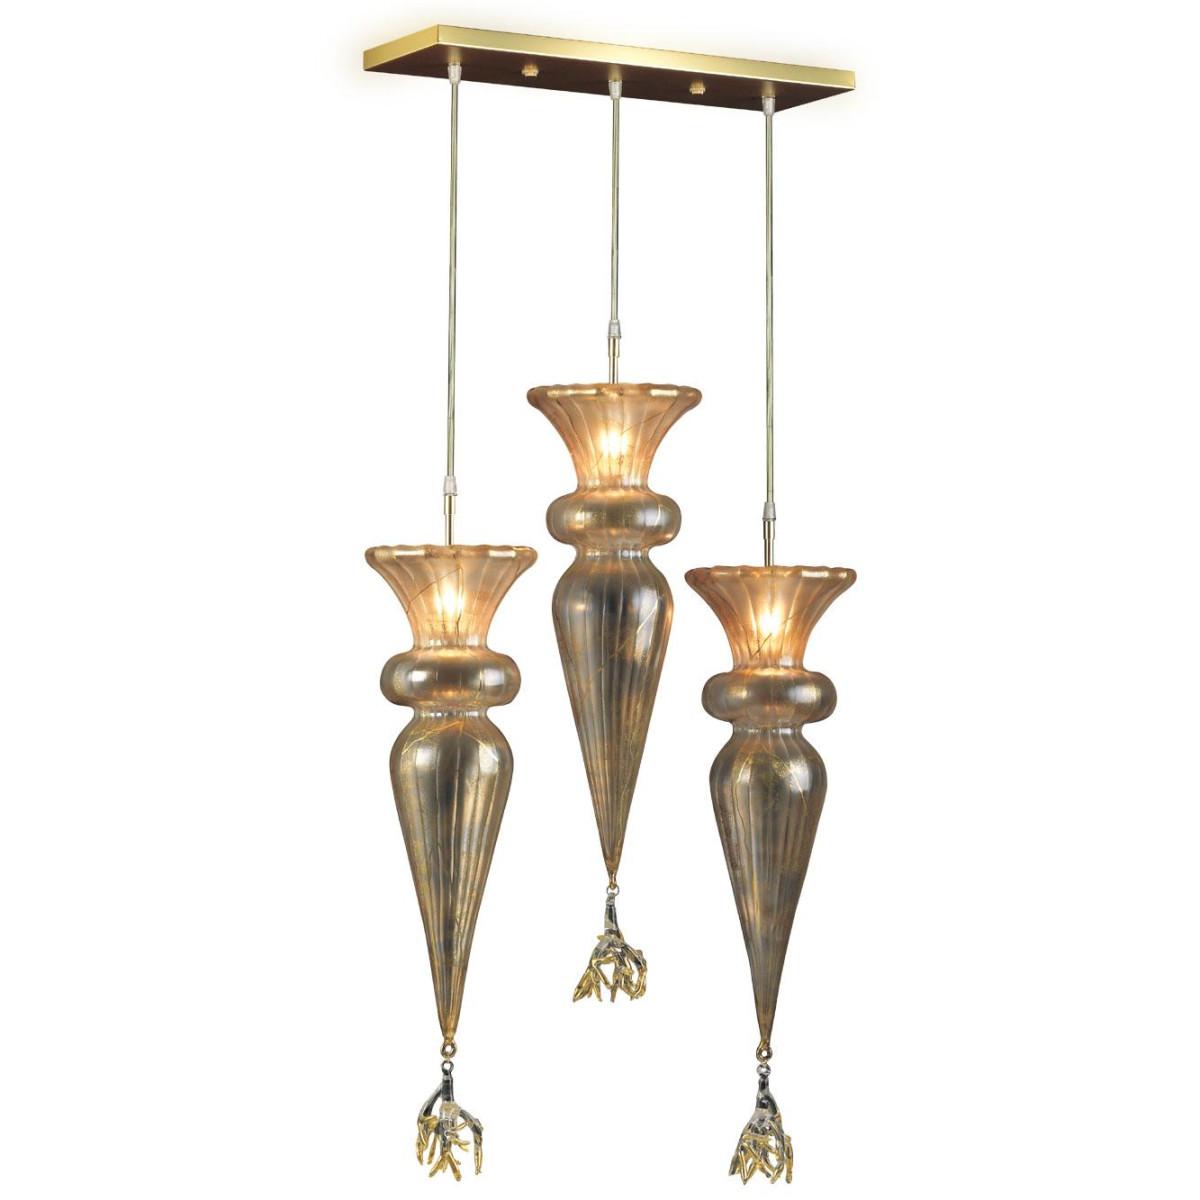 """Picche"" suspension en verre de Murano - 3 lumières - or"